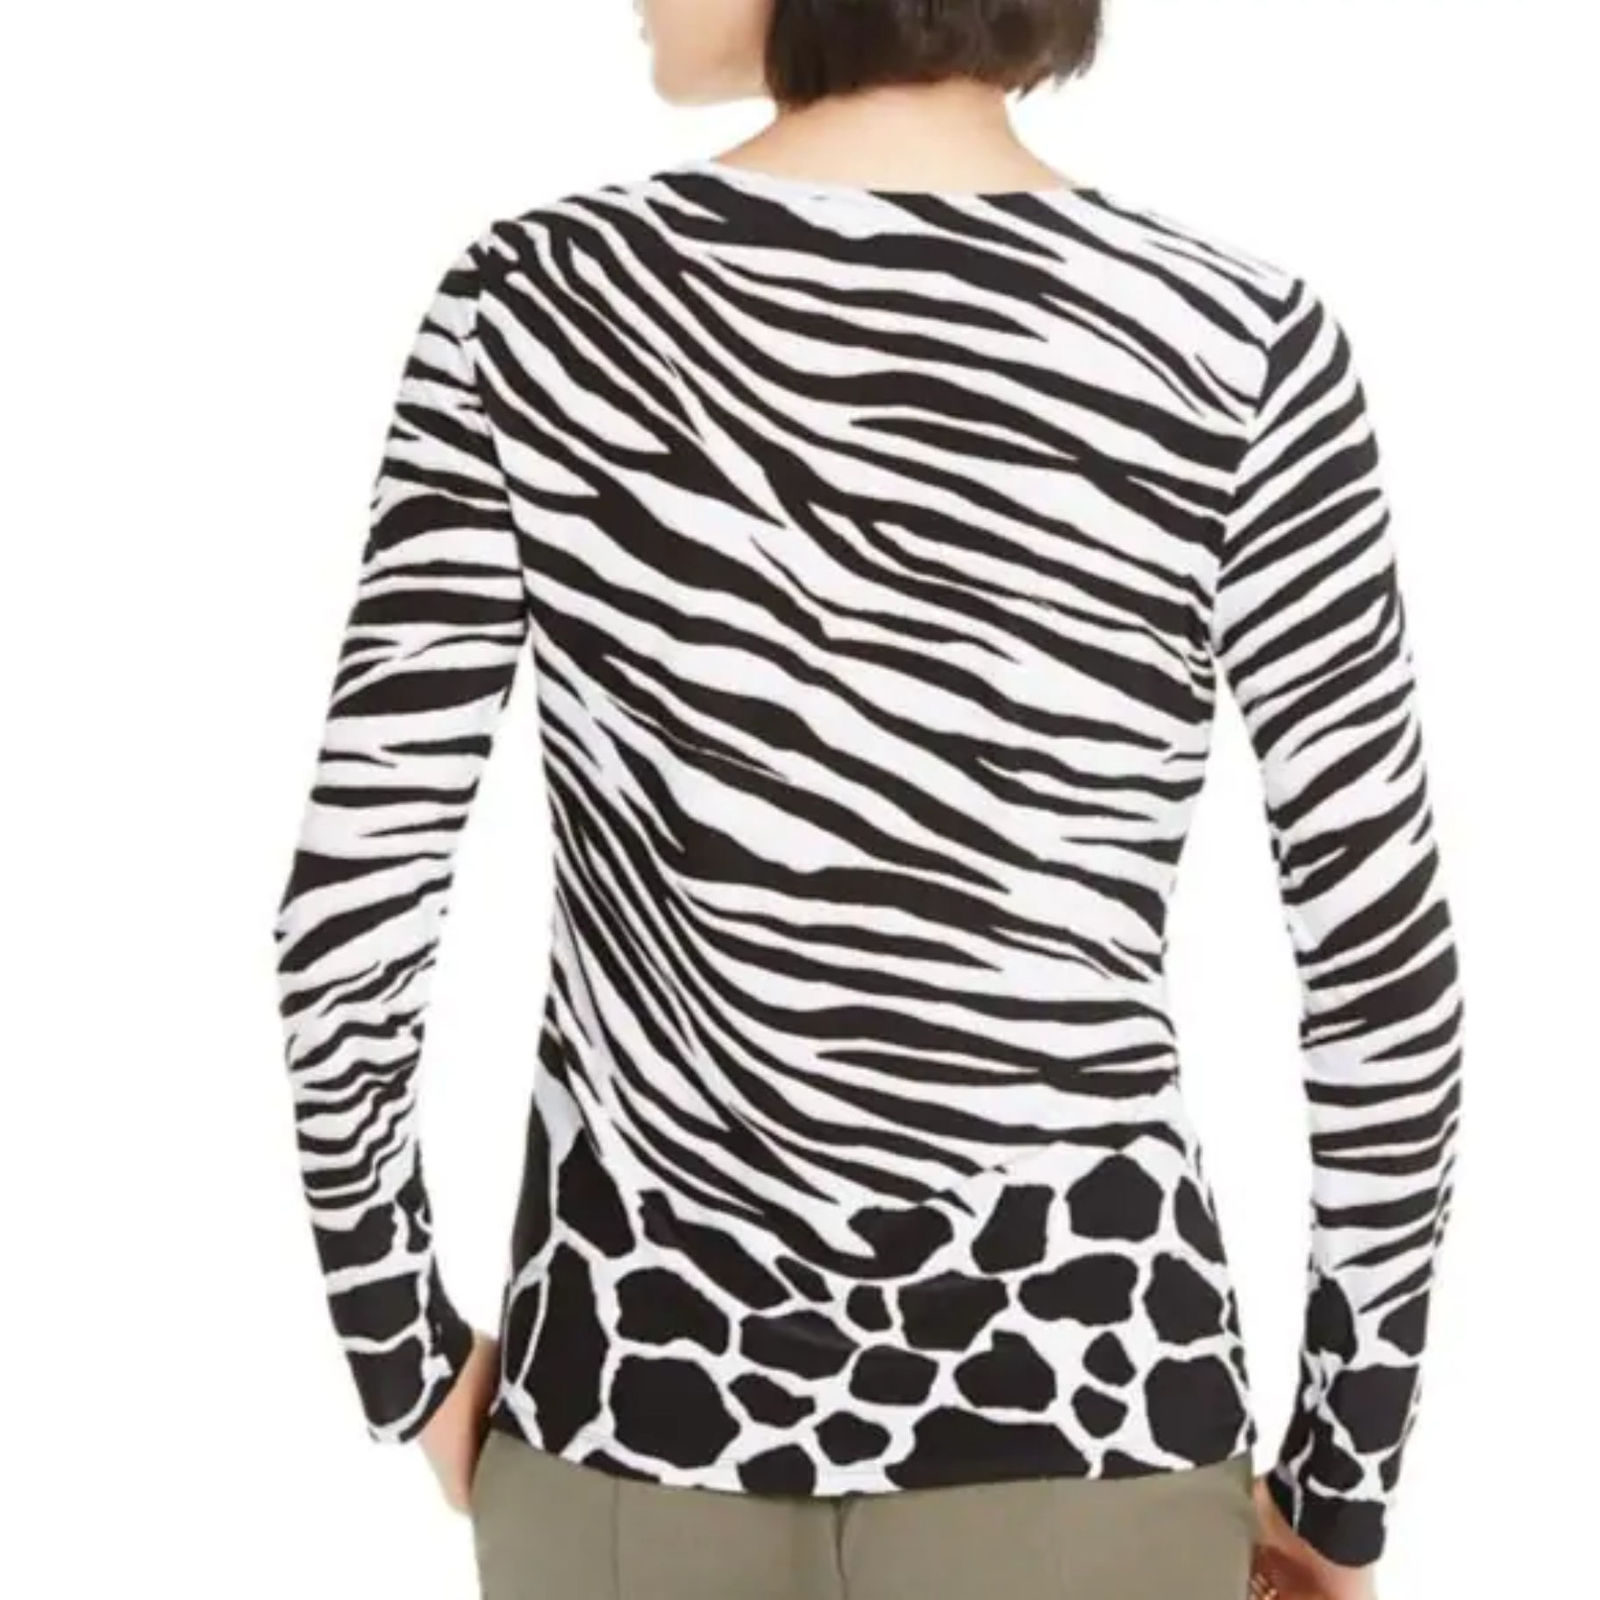 nwt Zebra Print Top Petite white/black L image 2